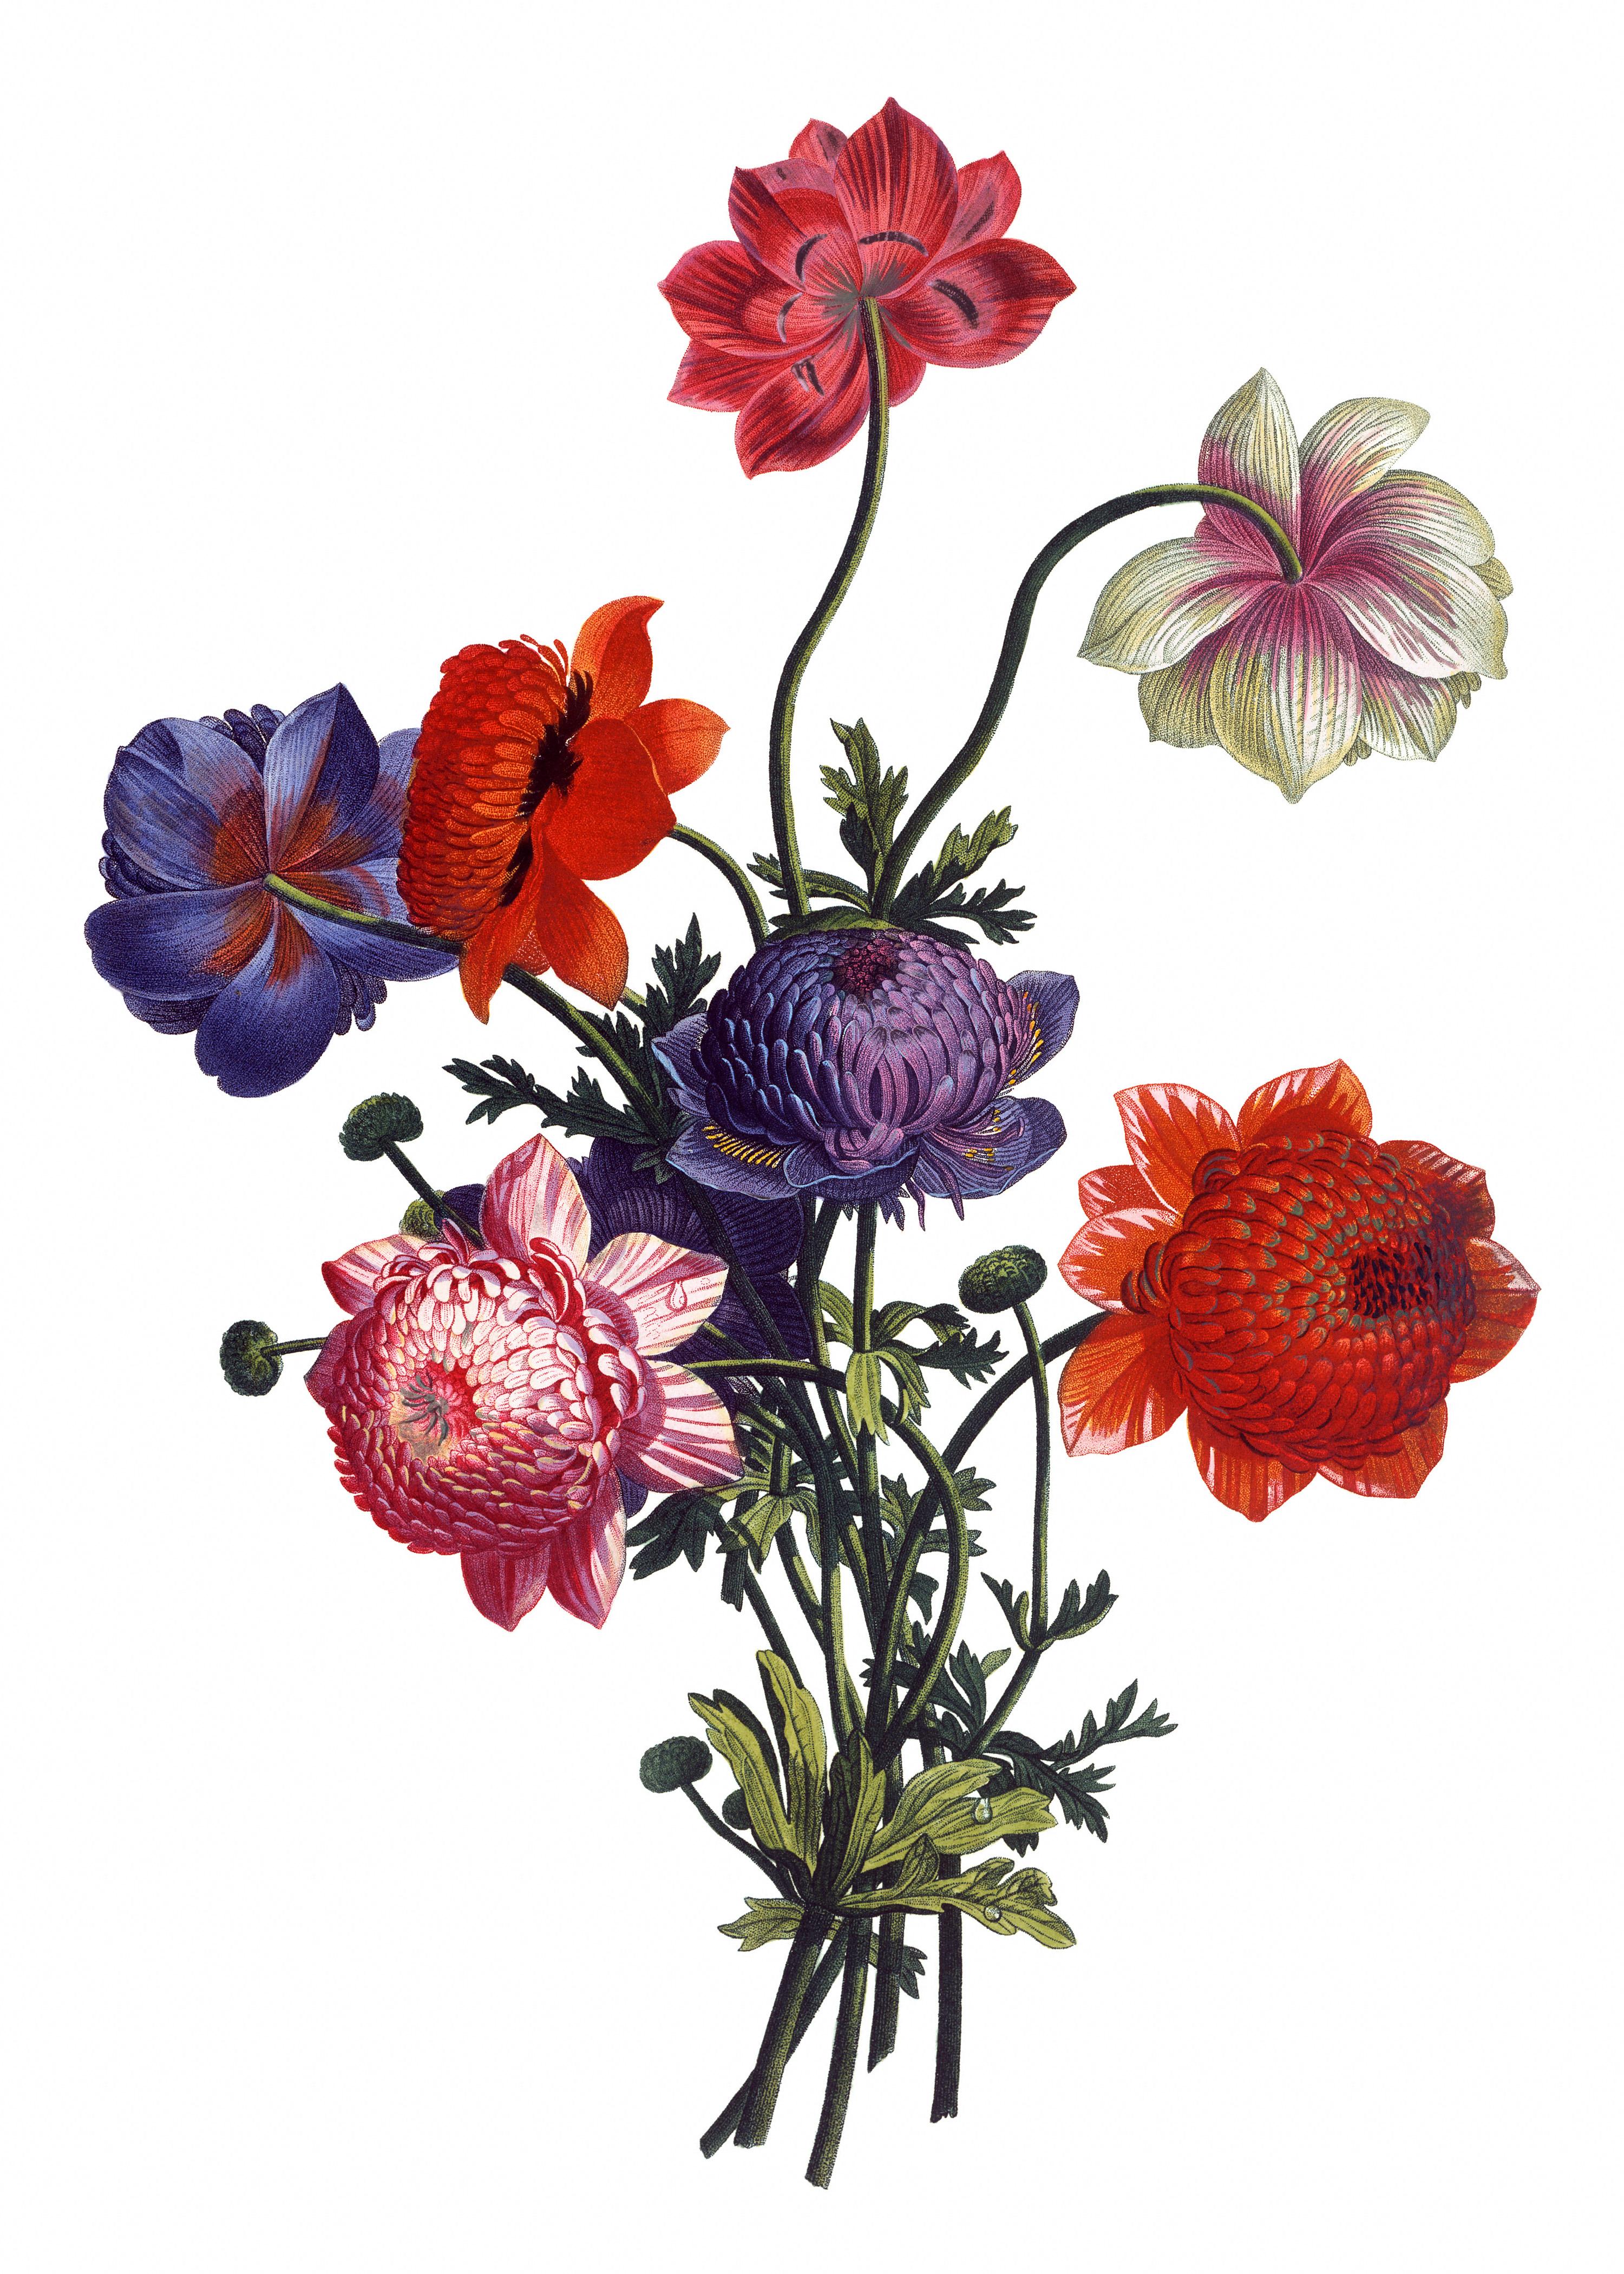 Drawn peony vintage floral 27 Vintage of The IllustrationsIllustrations